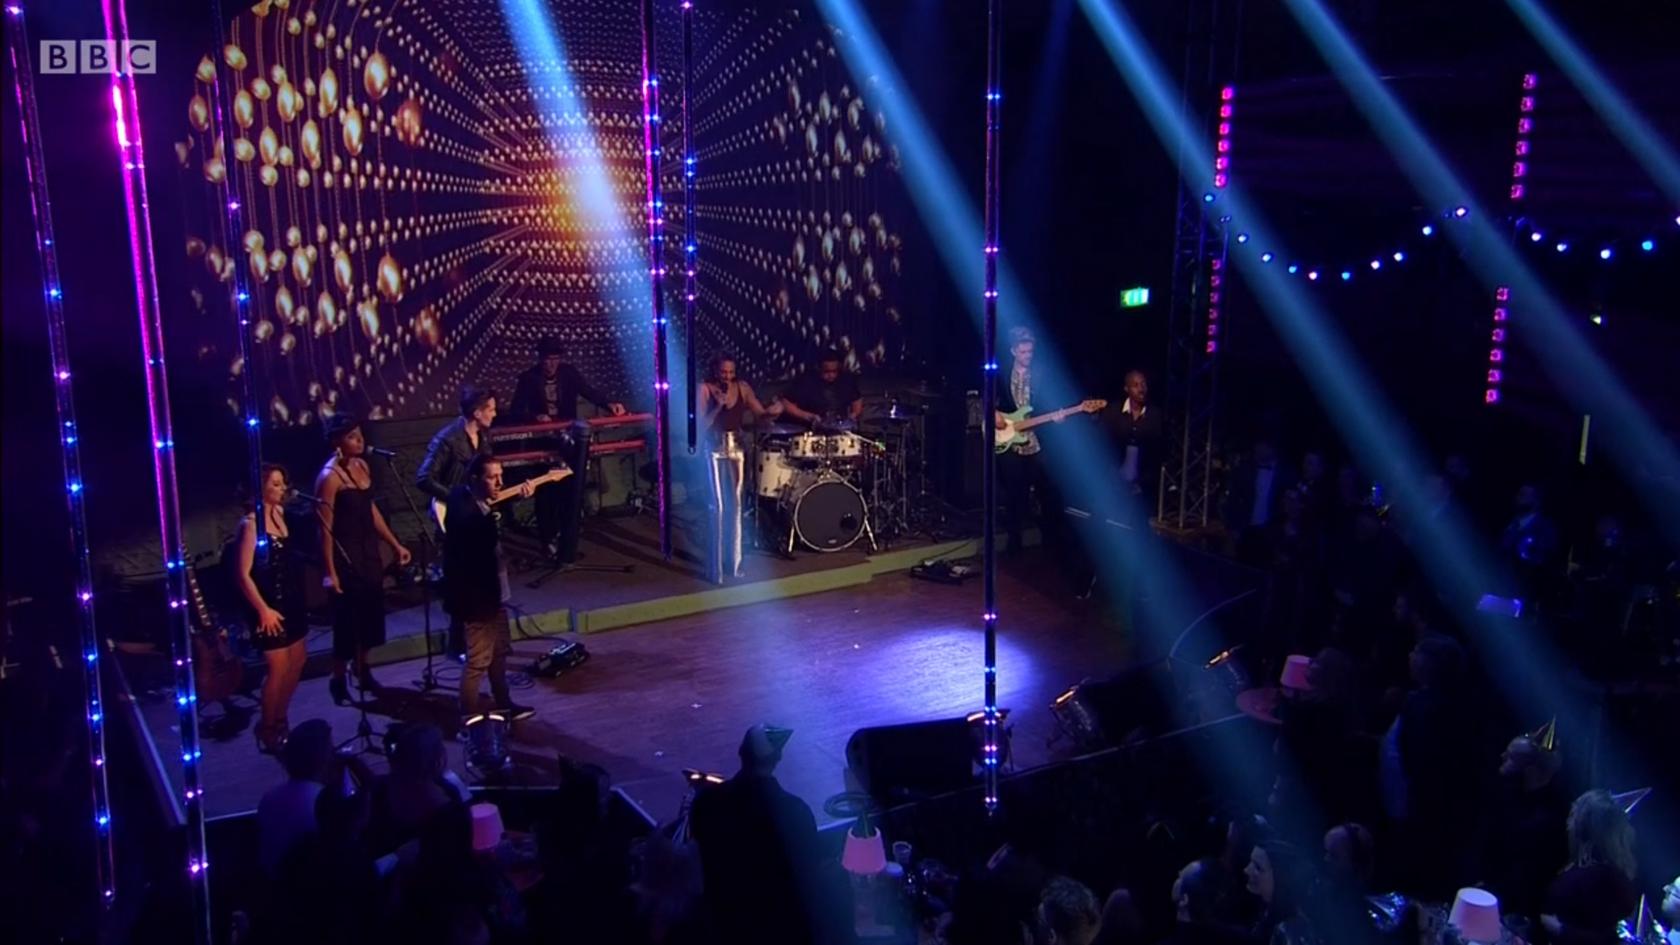 BBC Scotland - Hogmanay Live